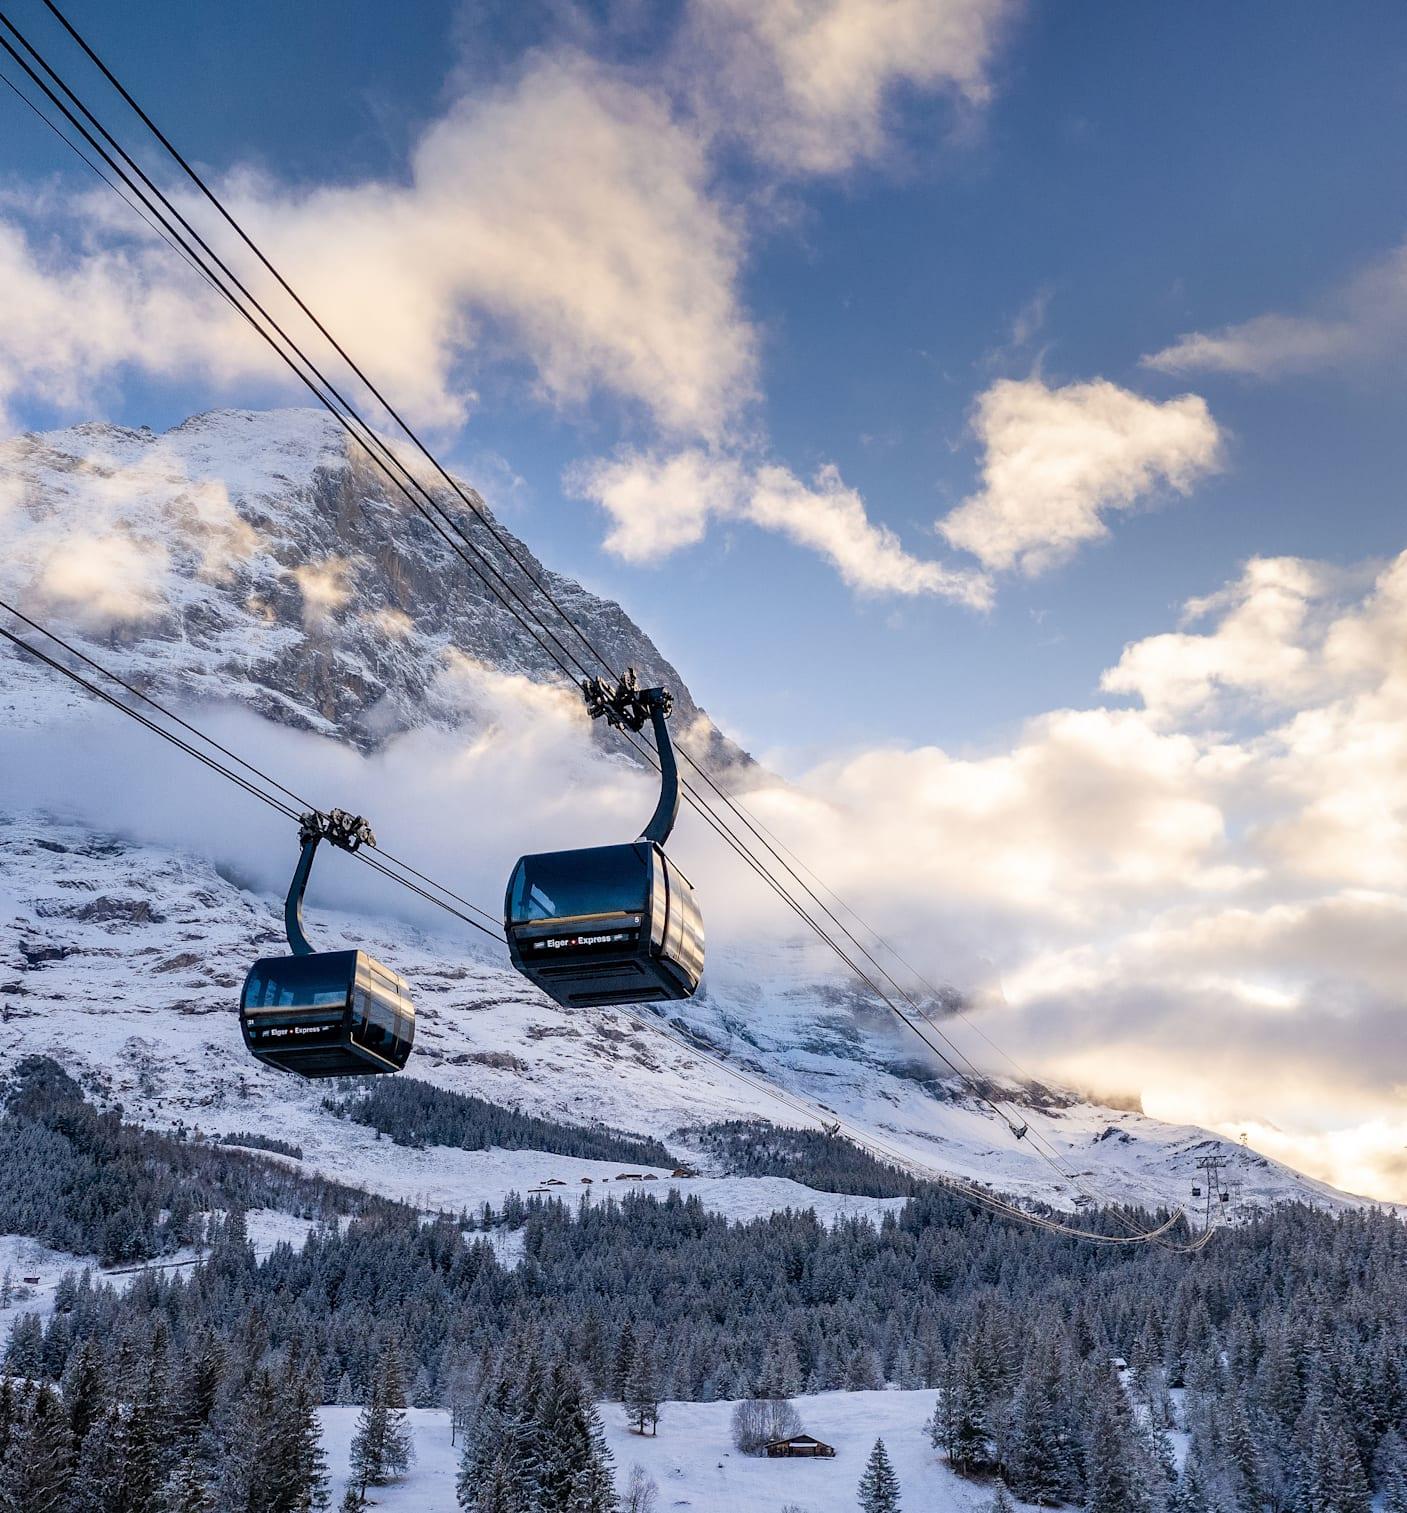 Seilbahn, Gondelbahn, Winter, Gondel, Switzerland, BernerOberland, Jungfrau, jungfraubahnen, Eiger, Grindelwald, vbahn, 3sbahn, Schweiz, November, Kabinenbahn, Terminal, Transport